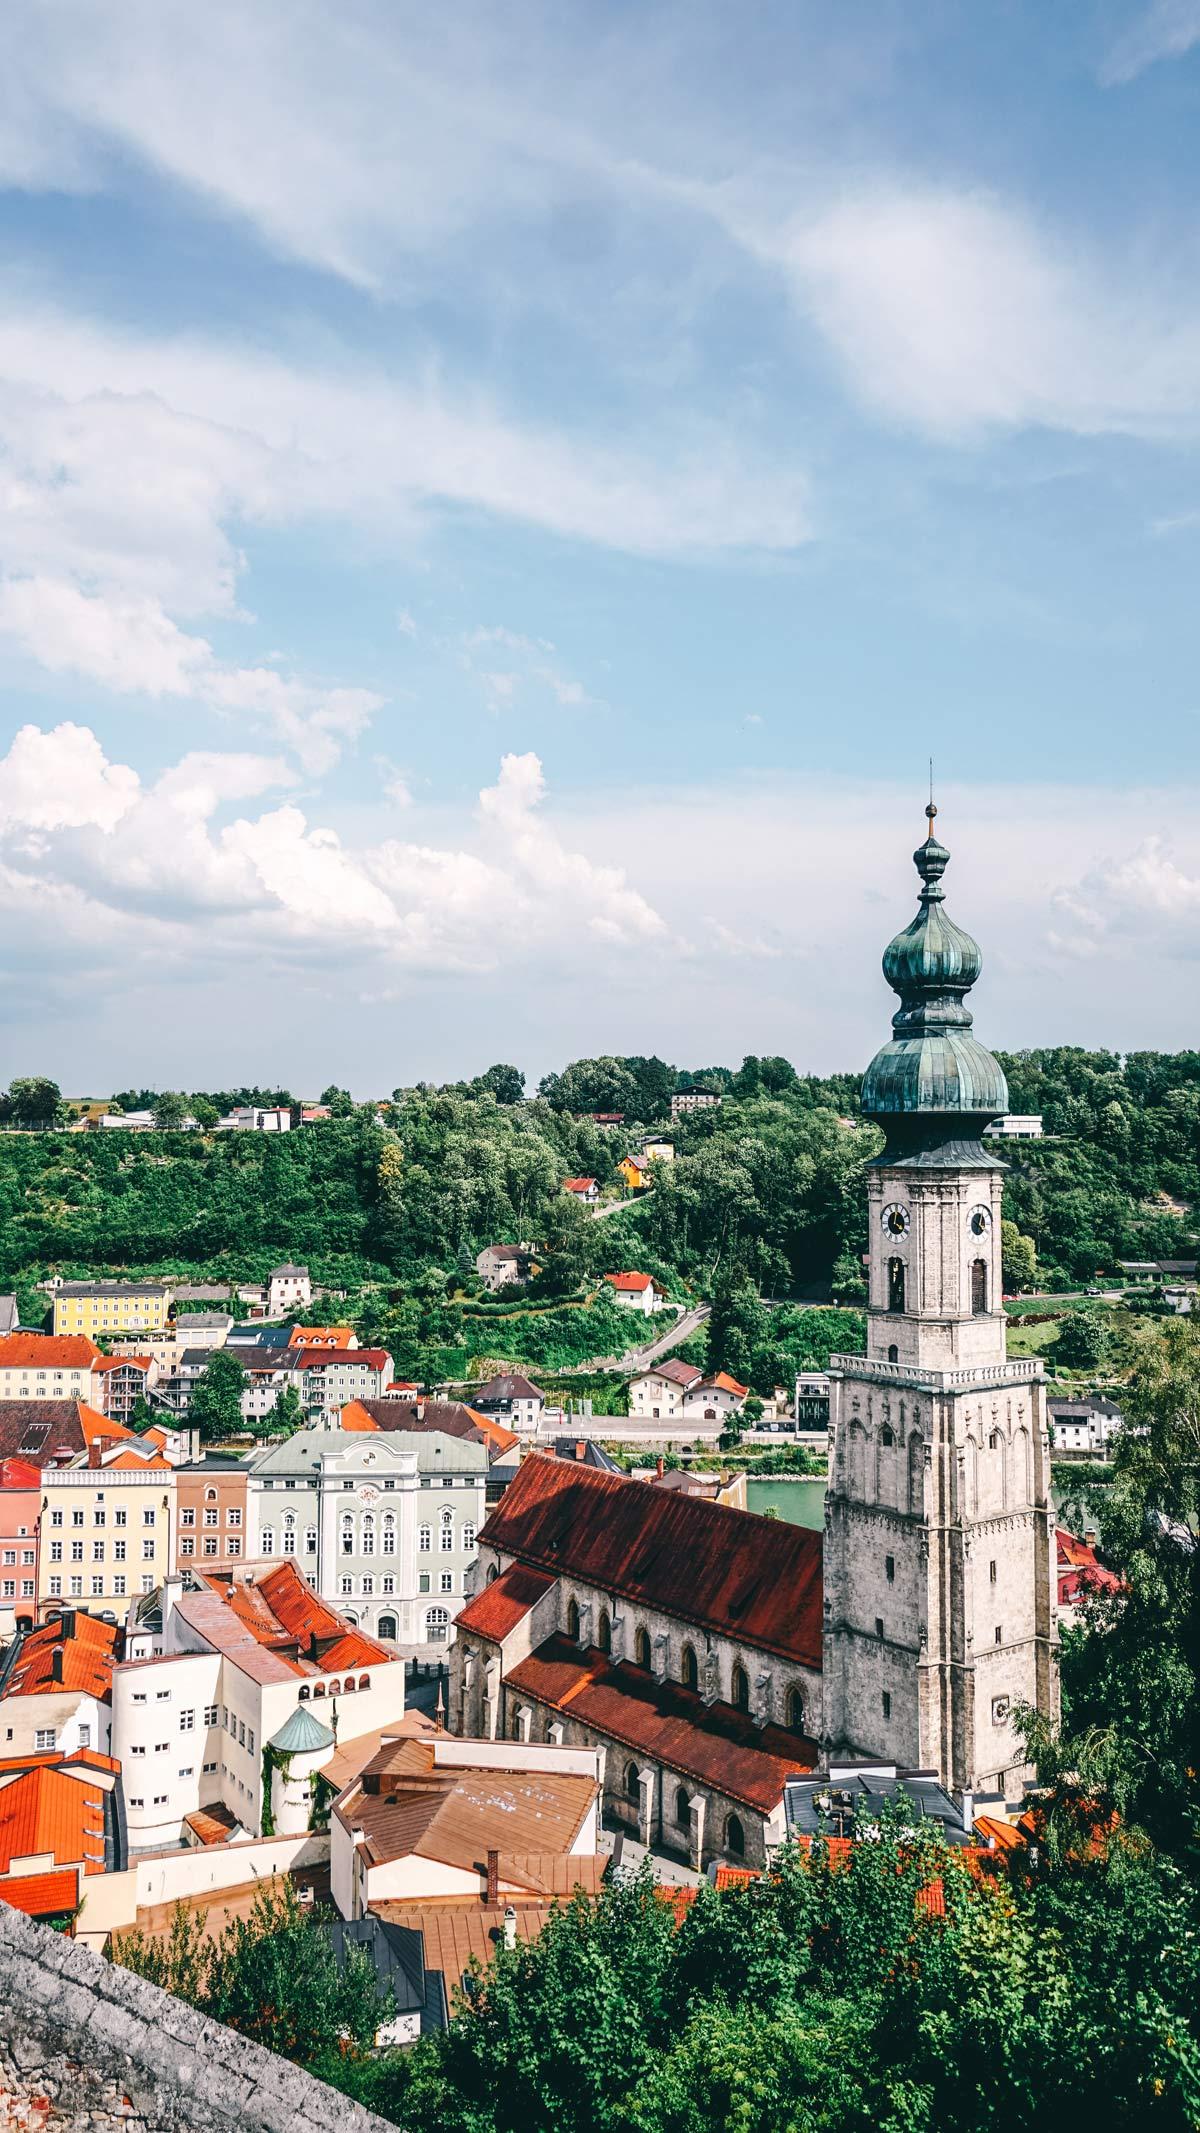 Burghausen Blick auf Altstadt